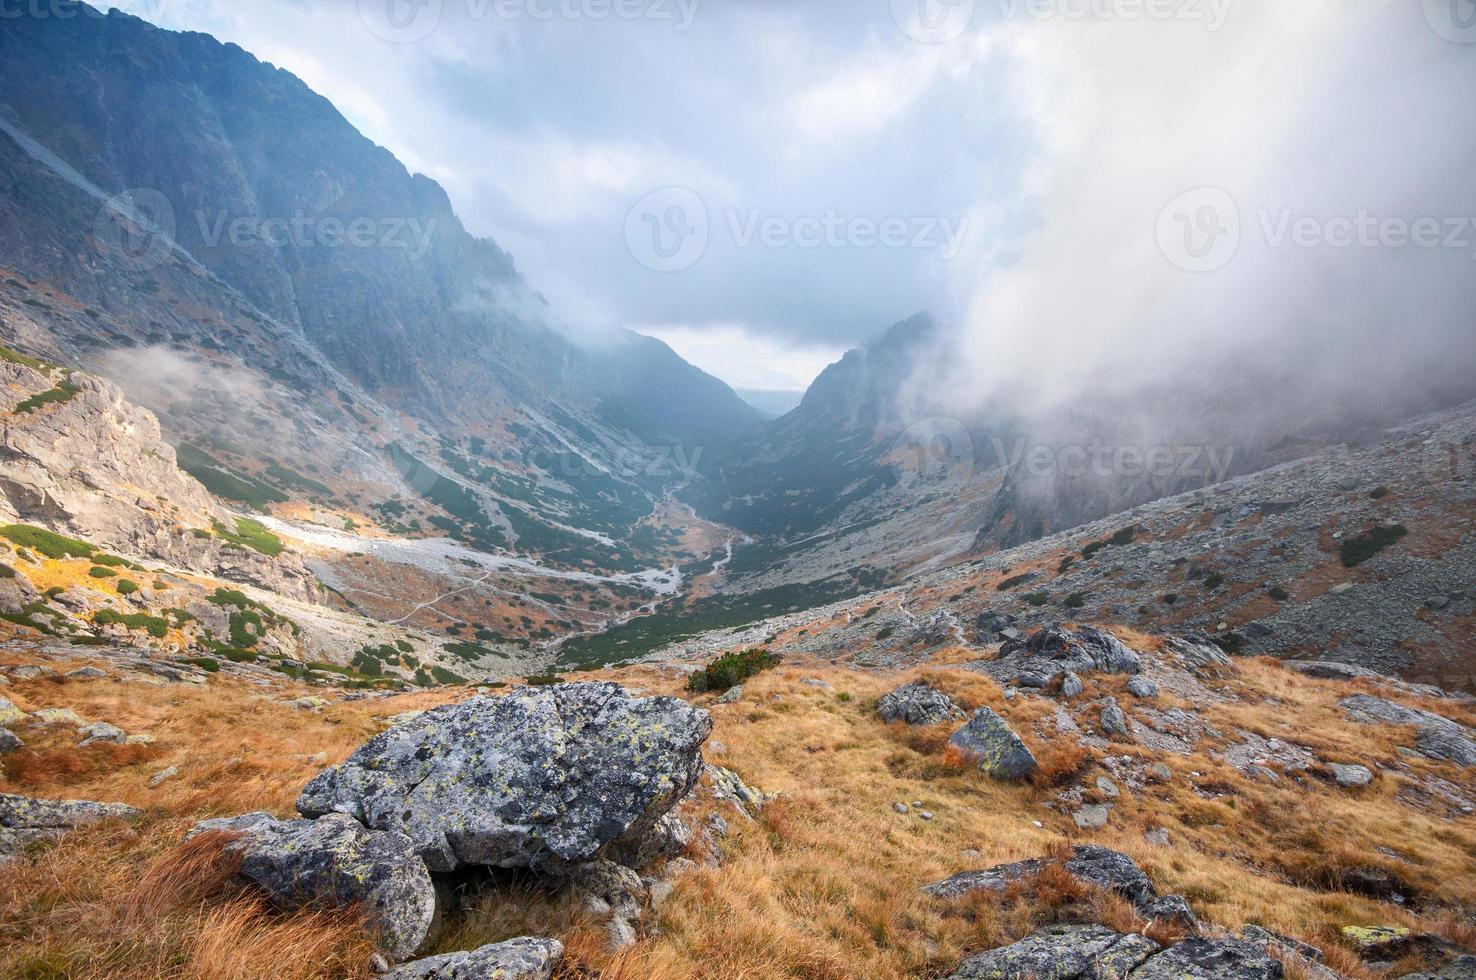 pequeno vale frio (mala studena dolina) foto